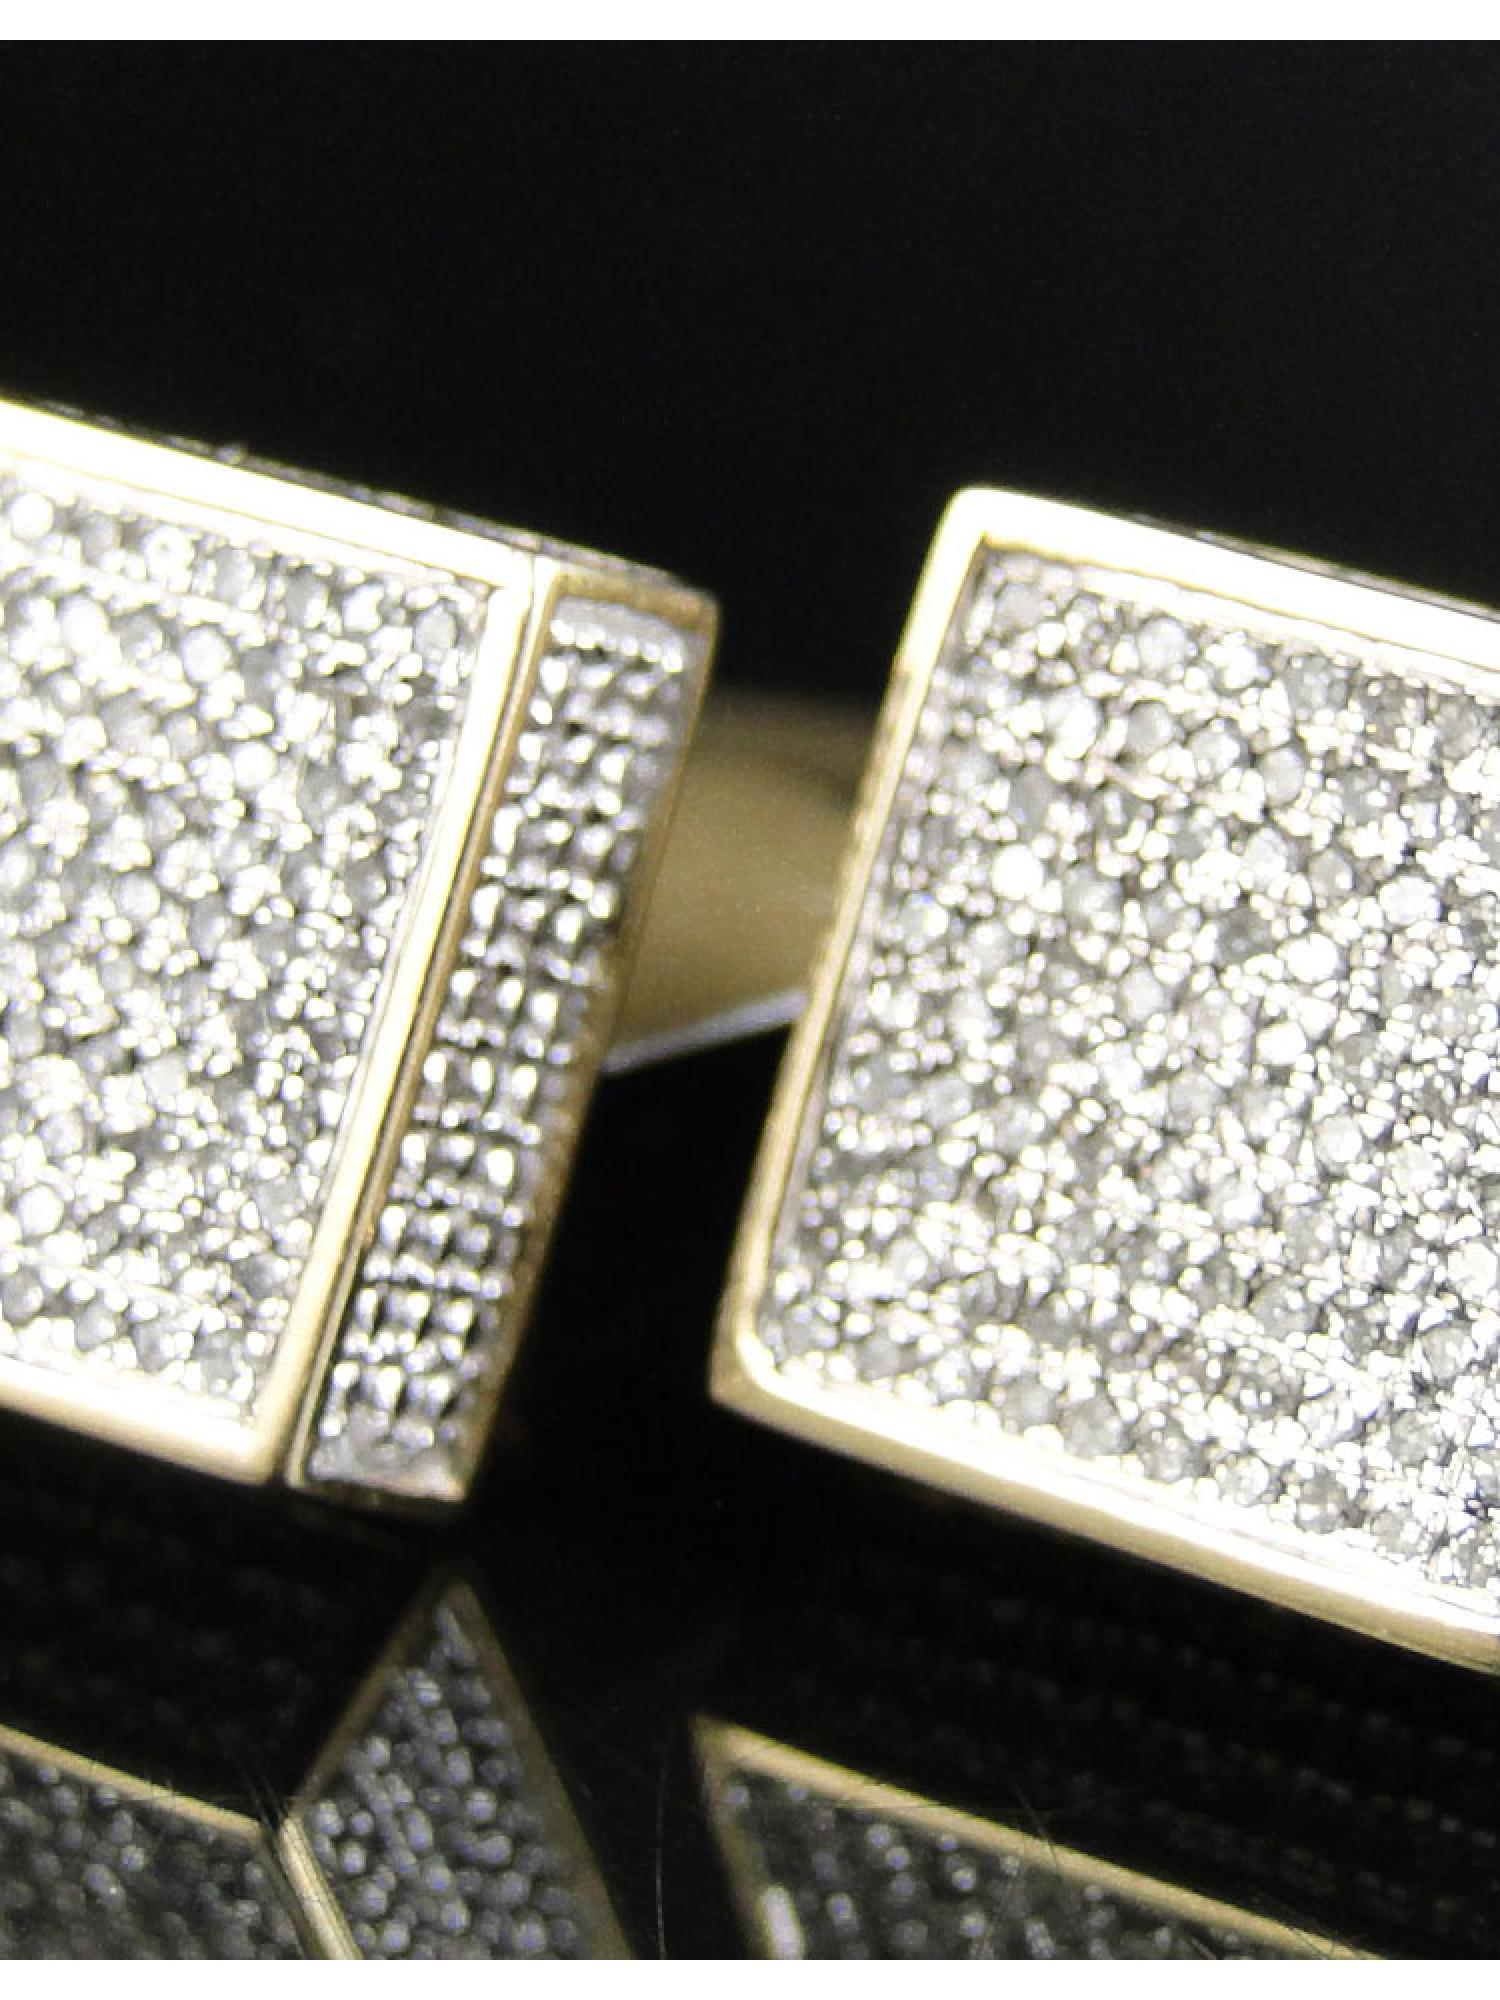 NEW MENS LADIES 20 MM GENUINE WHITE//CANARY DIAMOND KITE STUD EARRINGS 1.0 CT